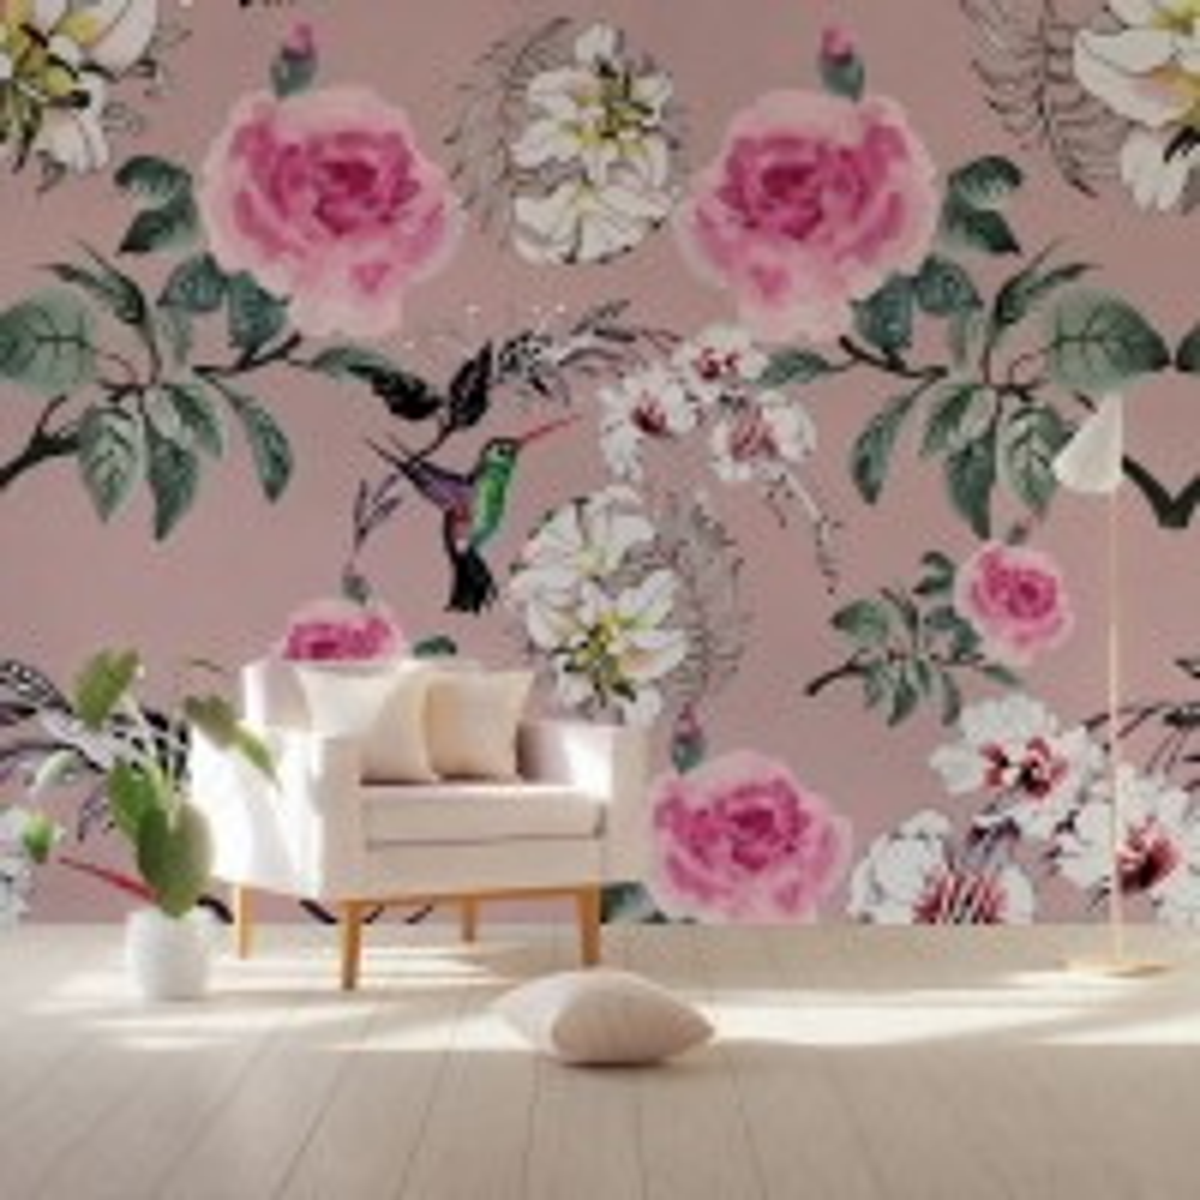 Vintage Pink Floral with Little Birds Wallpaper Mural